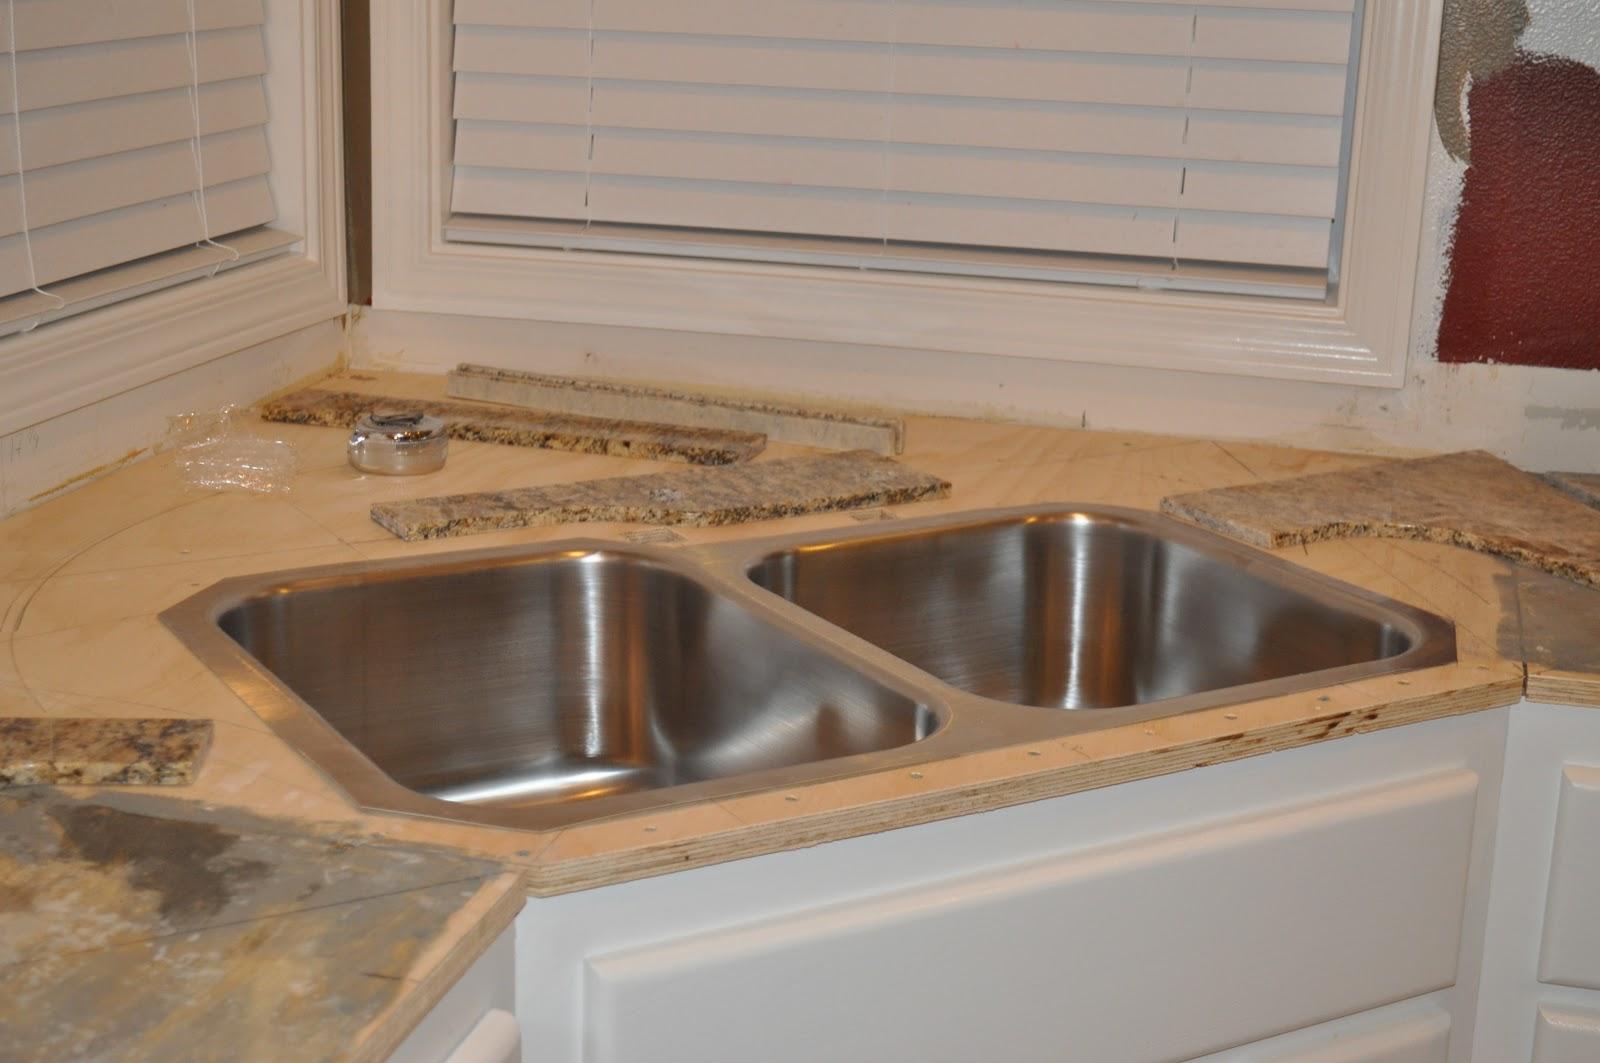 Kitchen Sinks For Granite Countertops the dizzy house: diy granite mini slabs + undermount sink